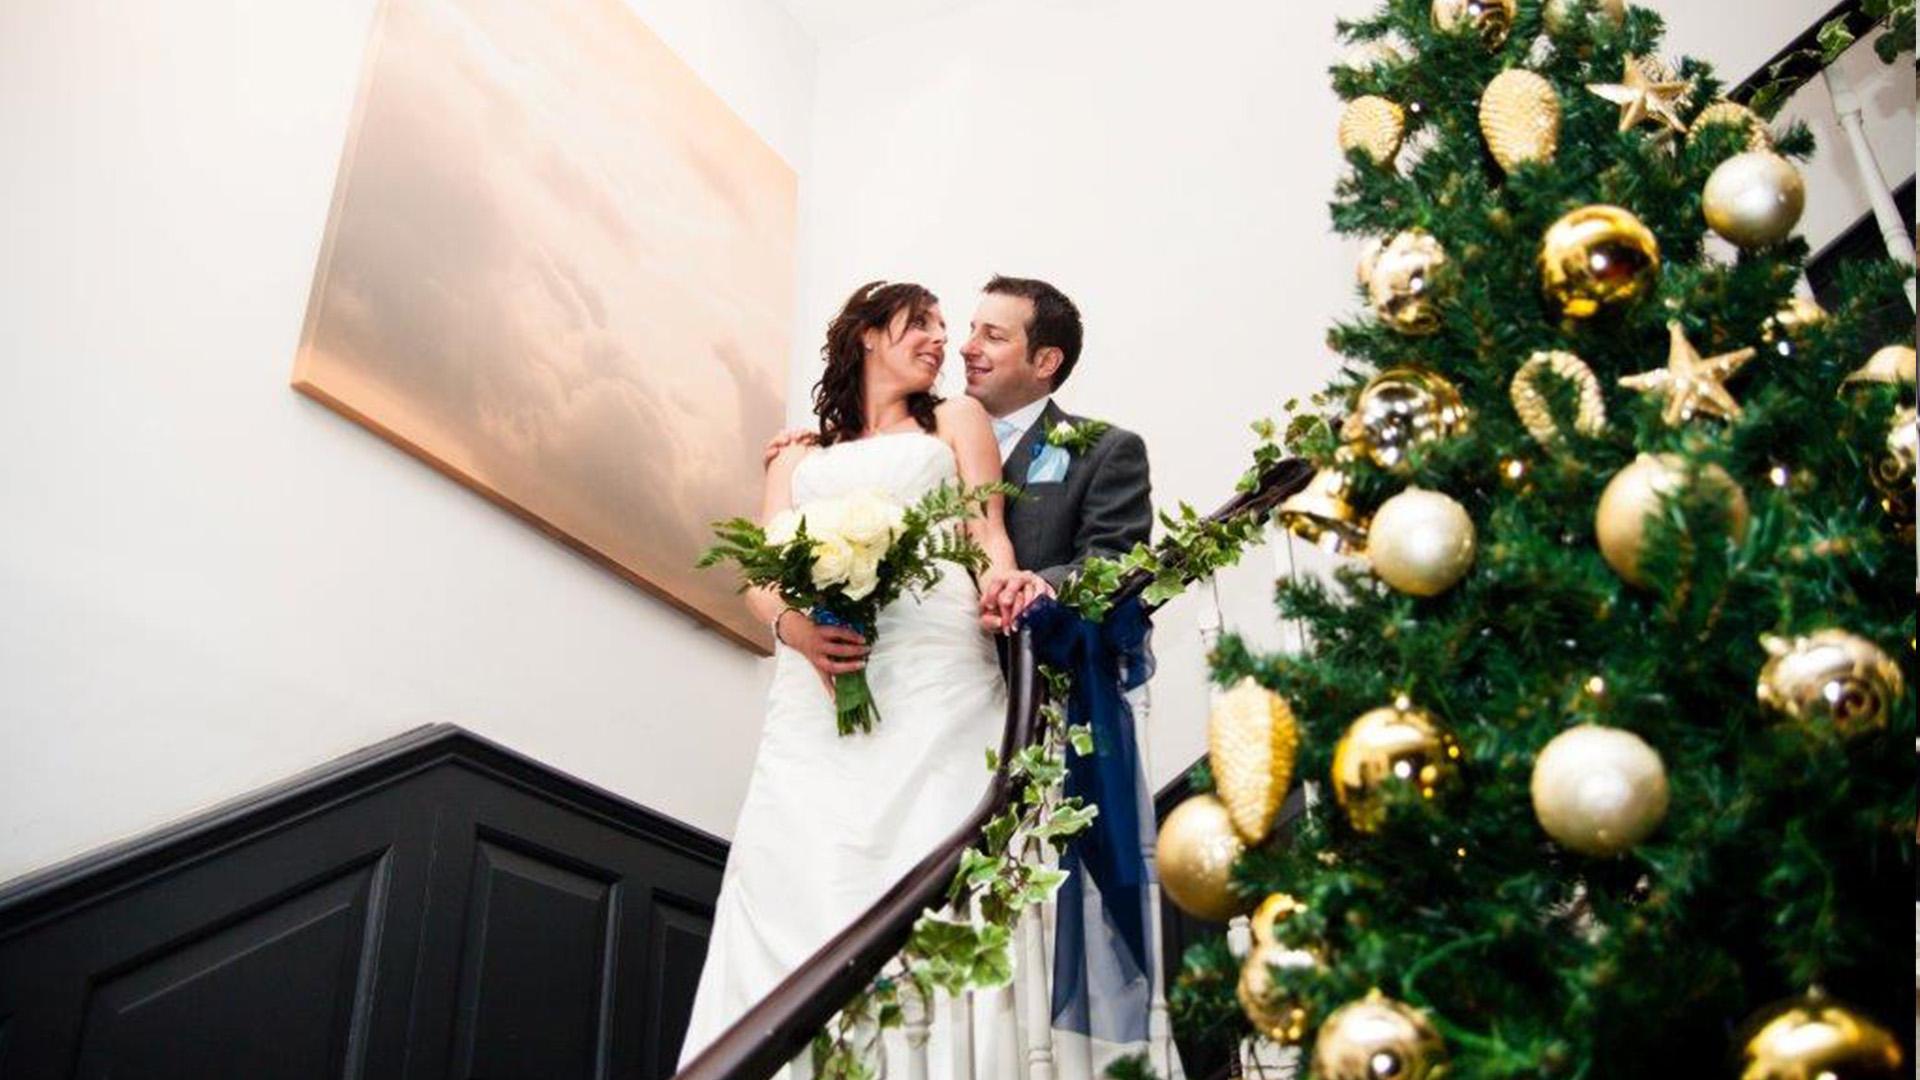 Wedding Venues in Hampshire Mercure Southampton Centre Dolphin Hotel winter wedding venues 2